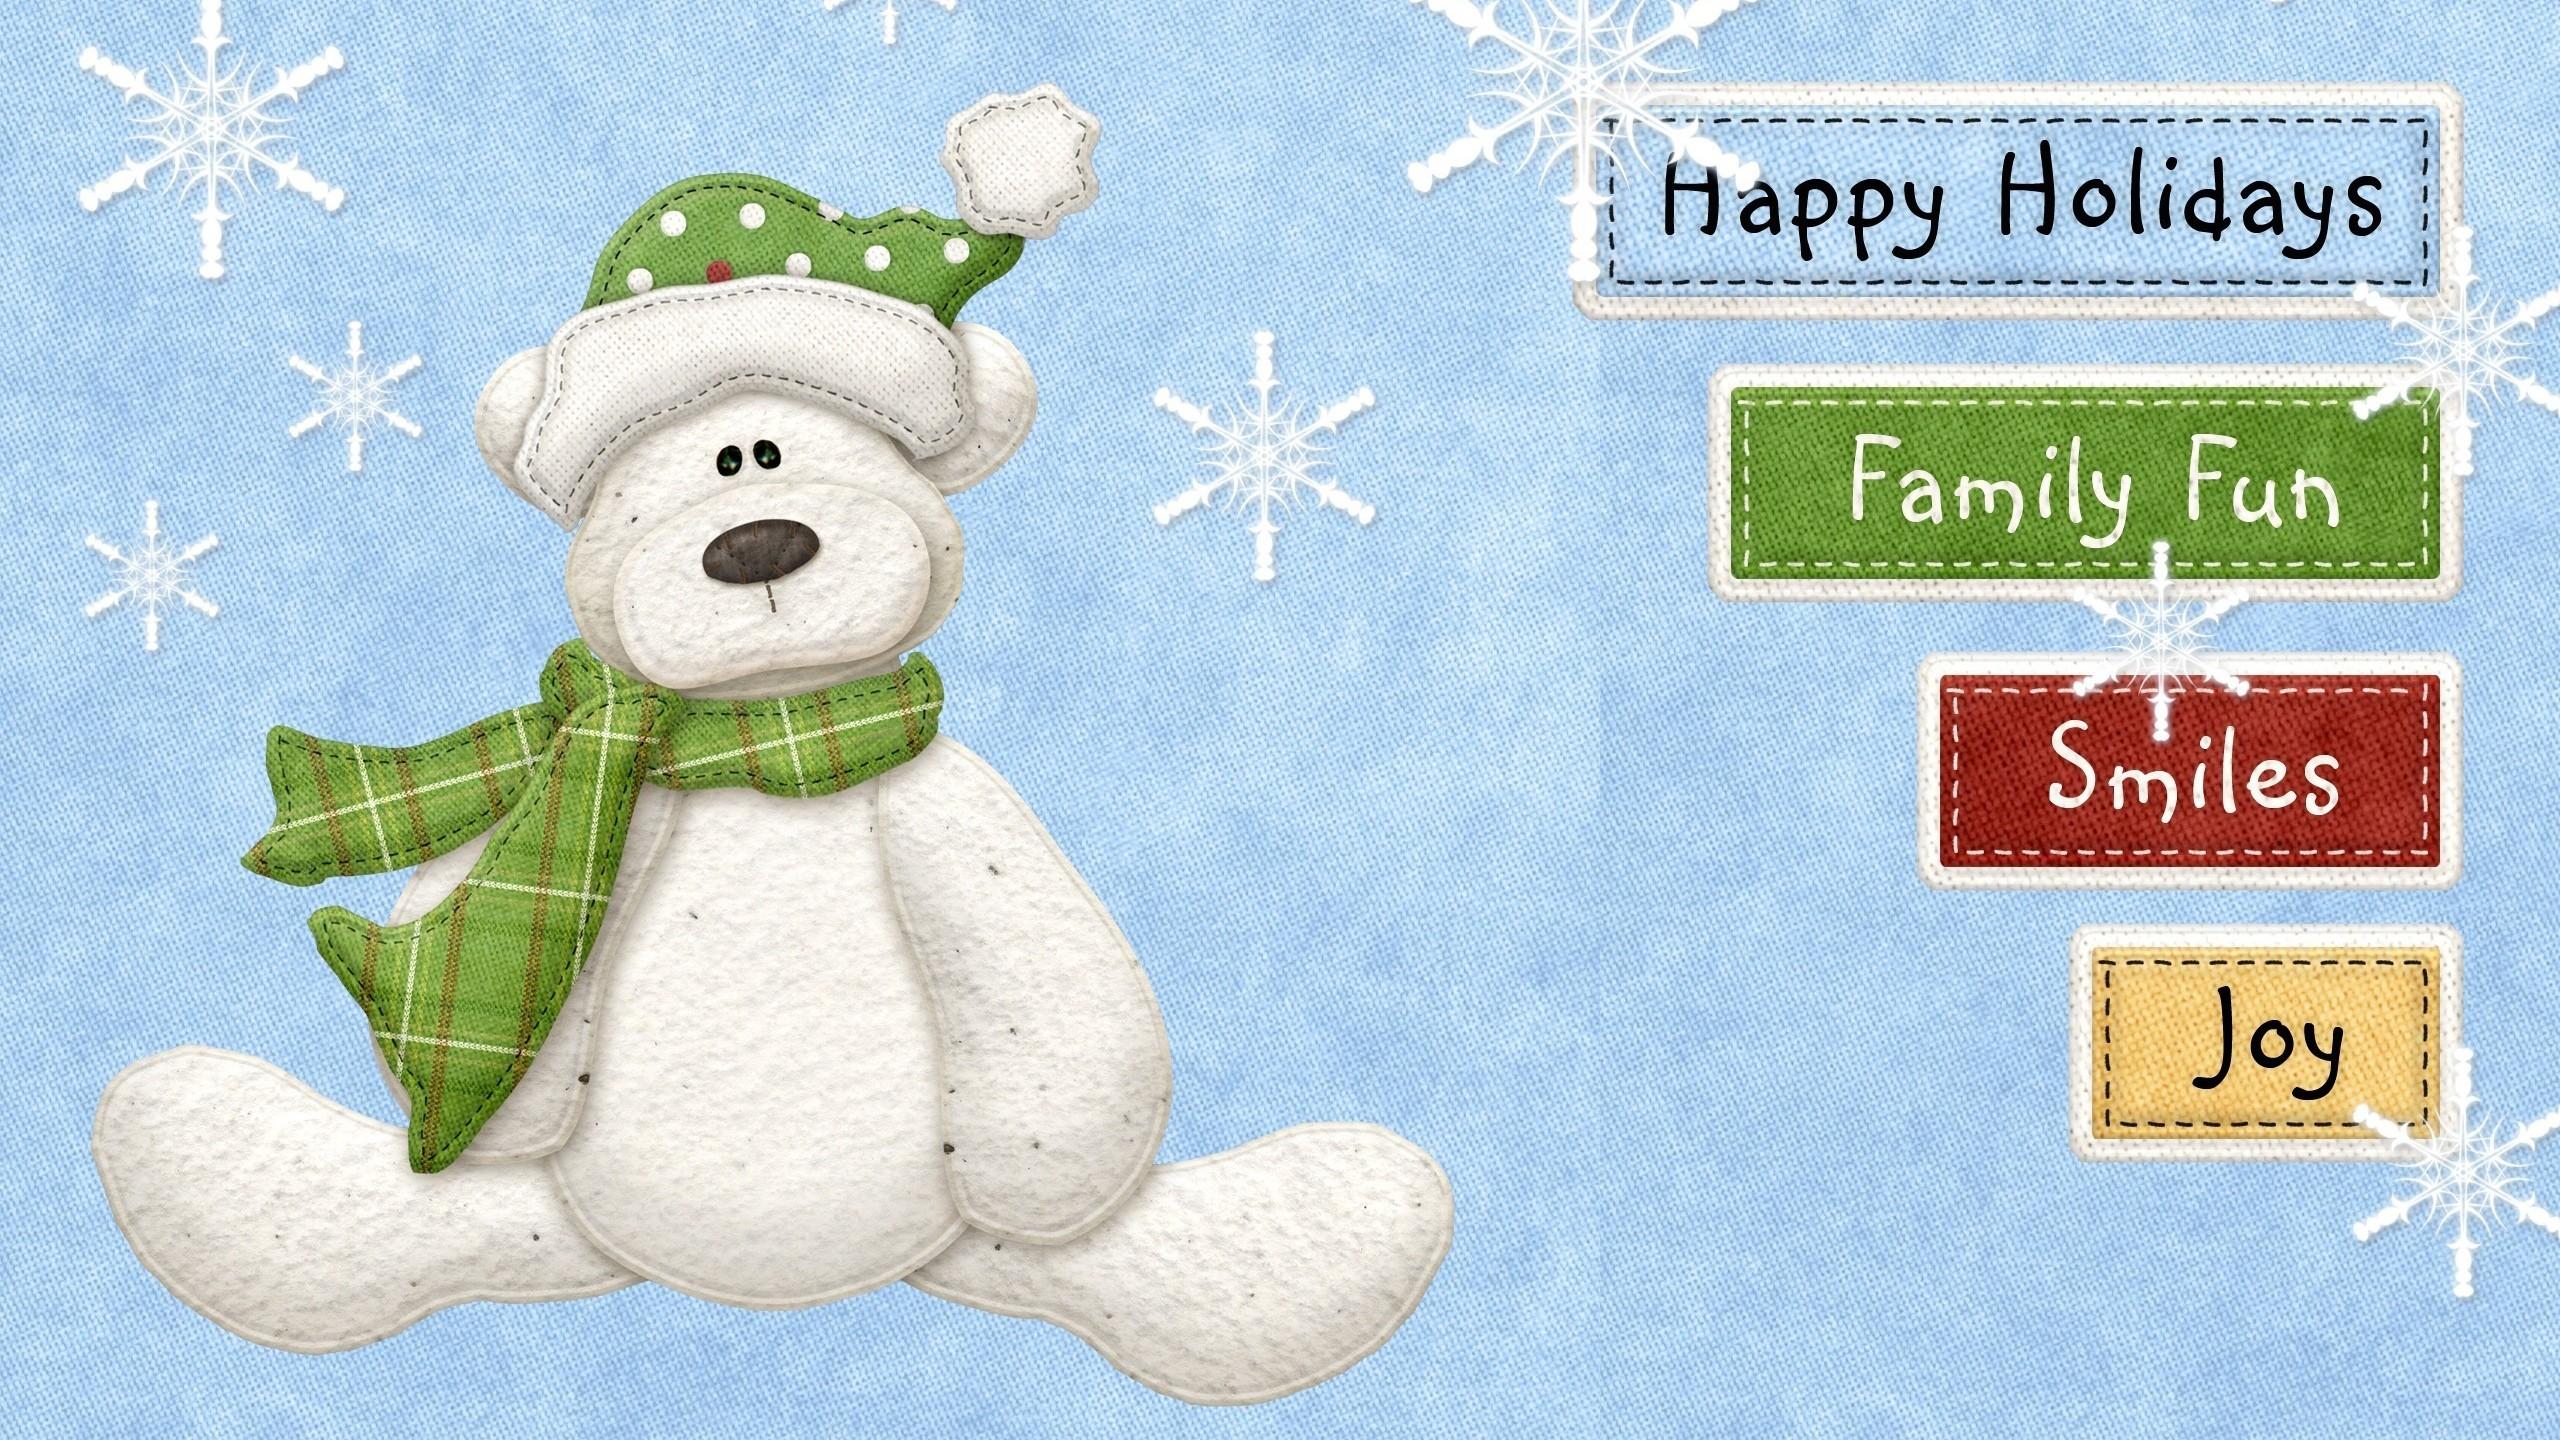 Happy Holidays Fun Joy Wallpapers HD Wallpapers ID 19270